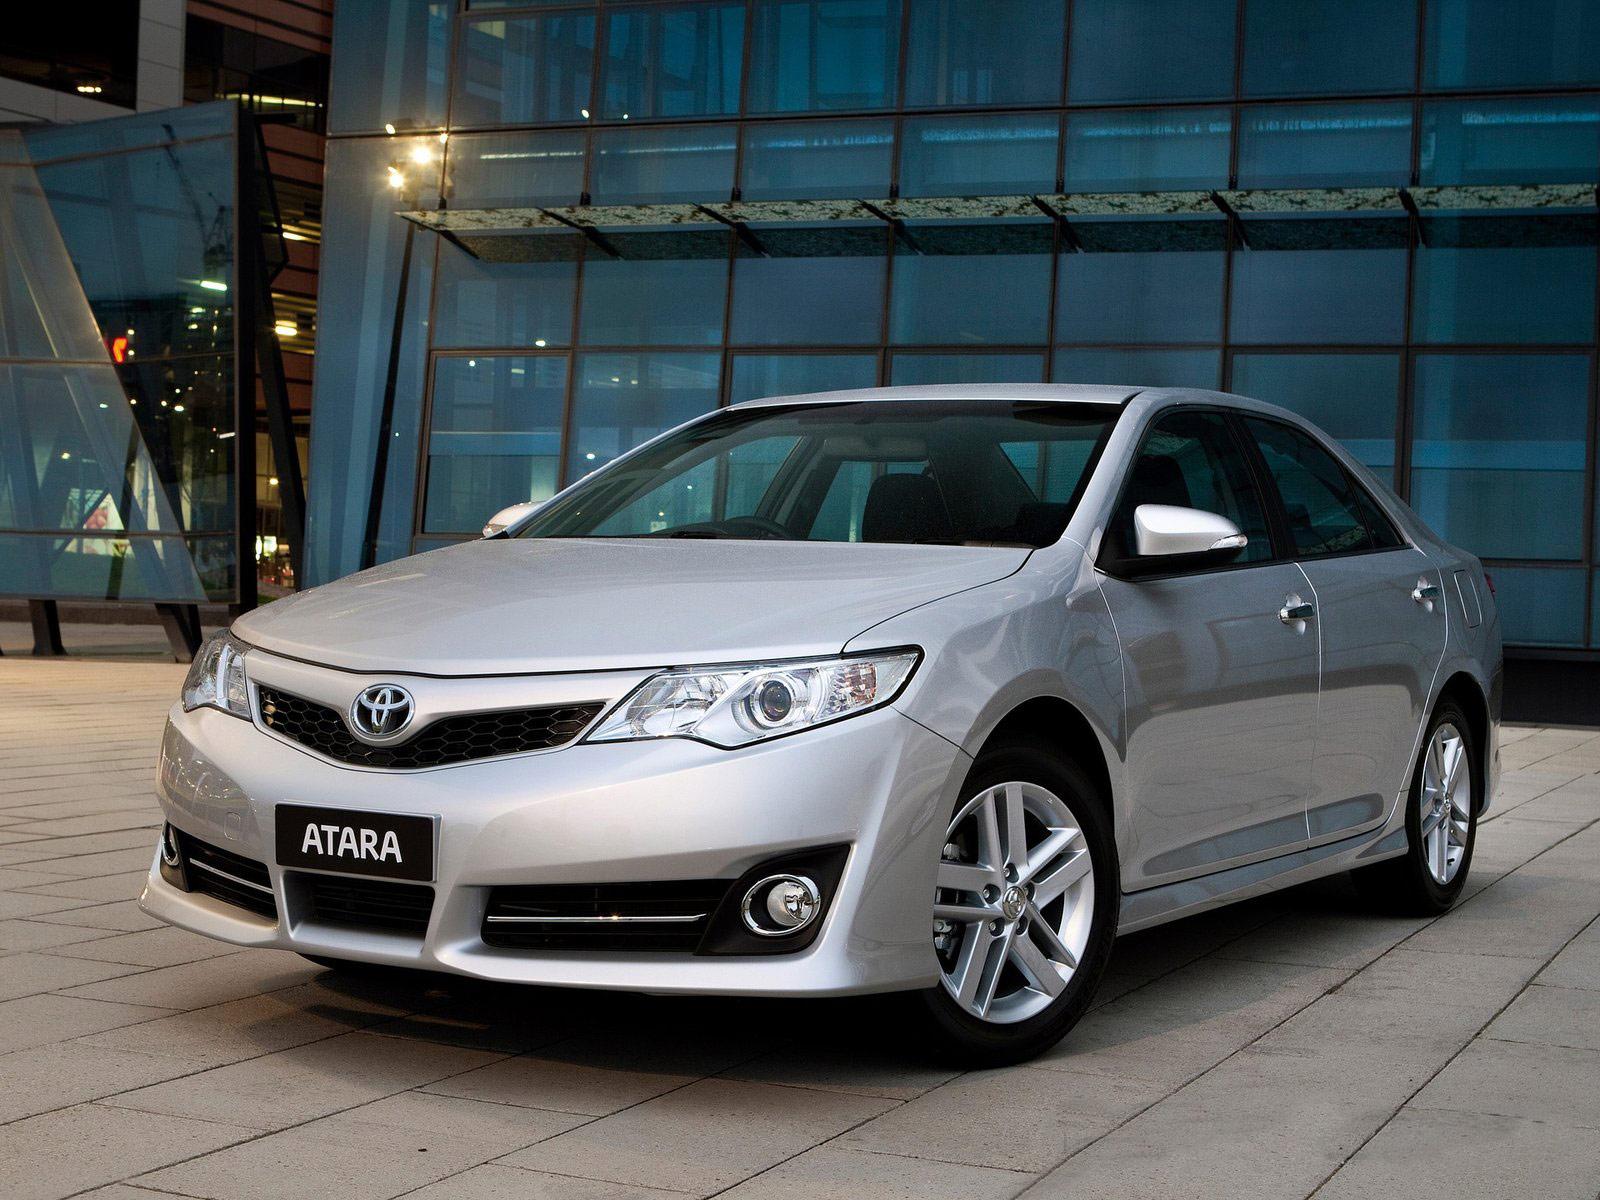 All New Camry 2.5 G Diskon Kijang Innova Gambar Mobil Toyota Au Version 2012